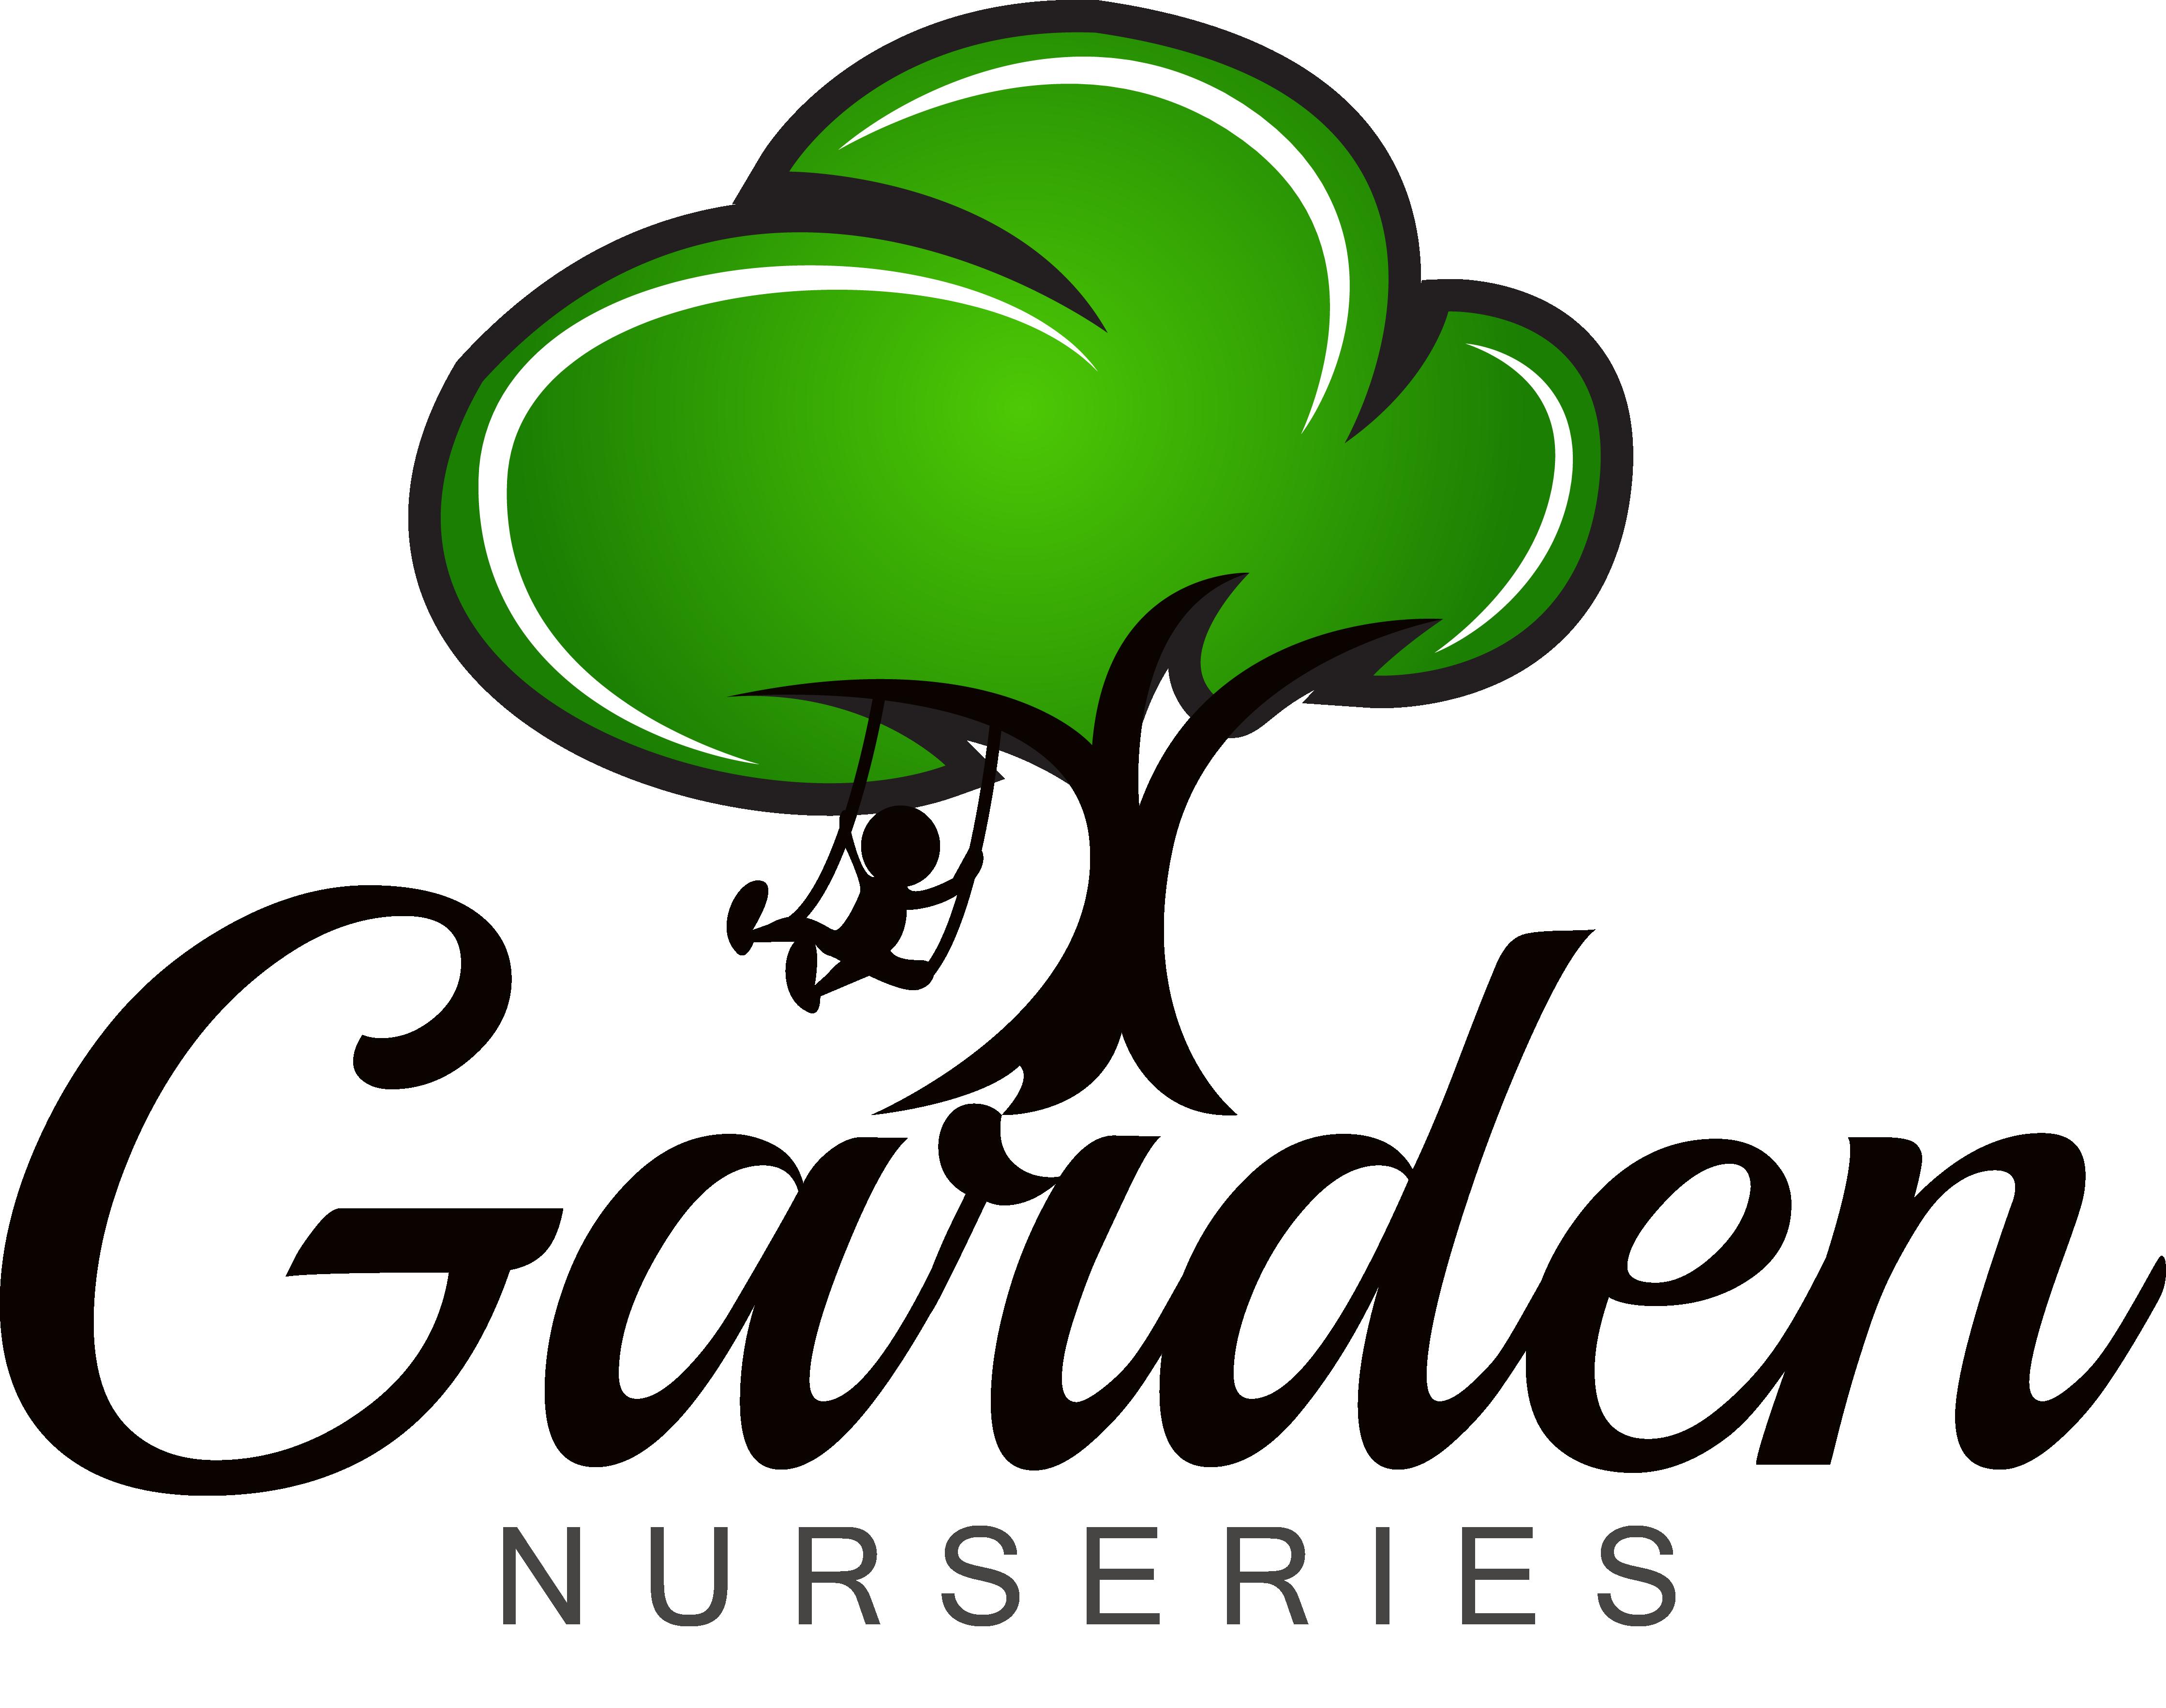 Gardening clipart garden centre. Nurseries near me for